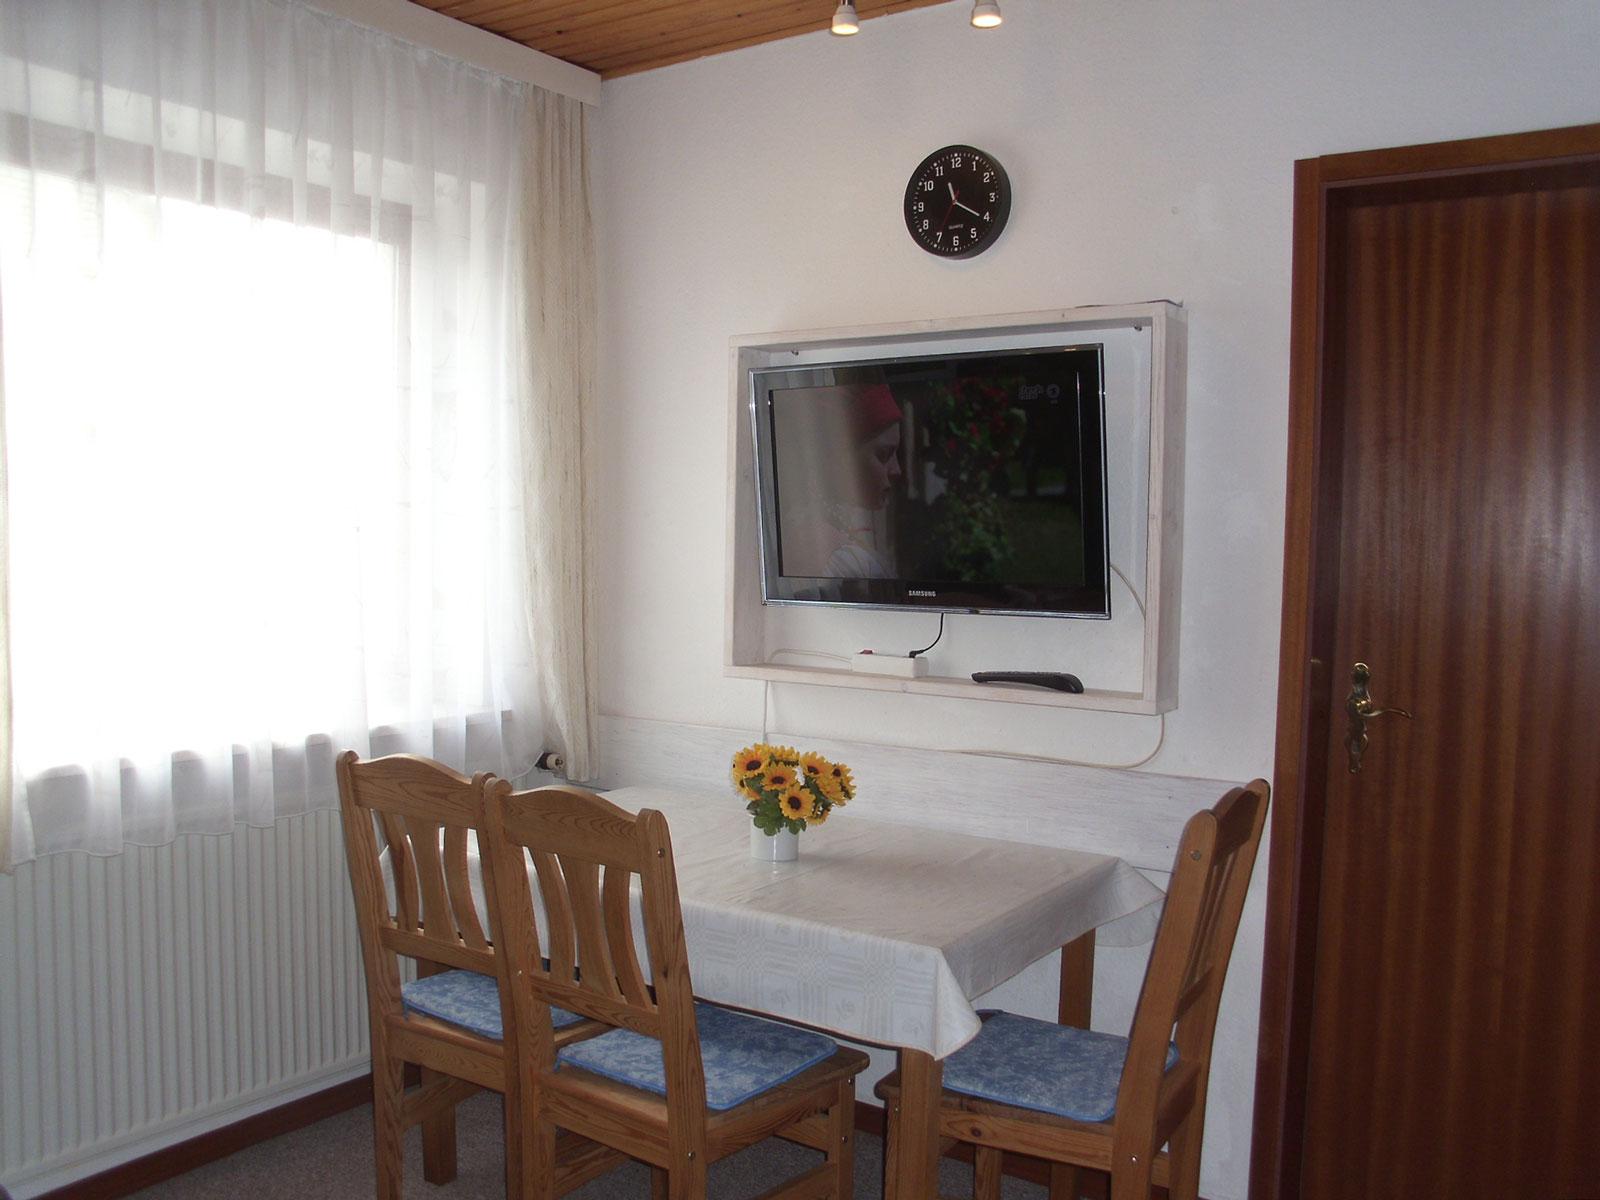 93 wohnzimmer englisch appreciatingthis via amelink exclusieve interieurs mbel. Black Bedroom Furniture Sets. Home Design Ideas